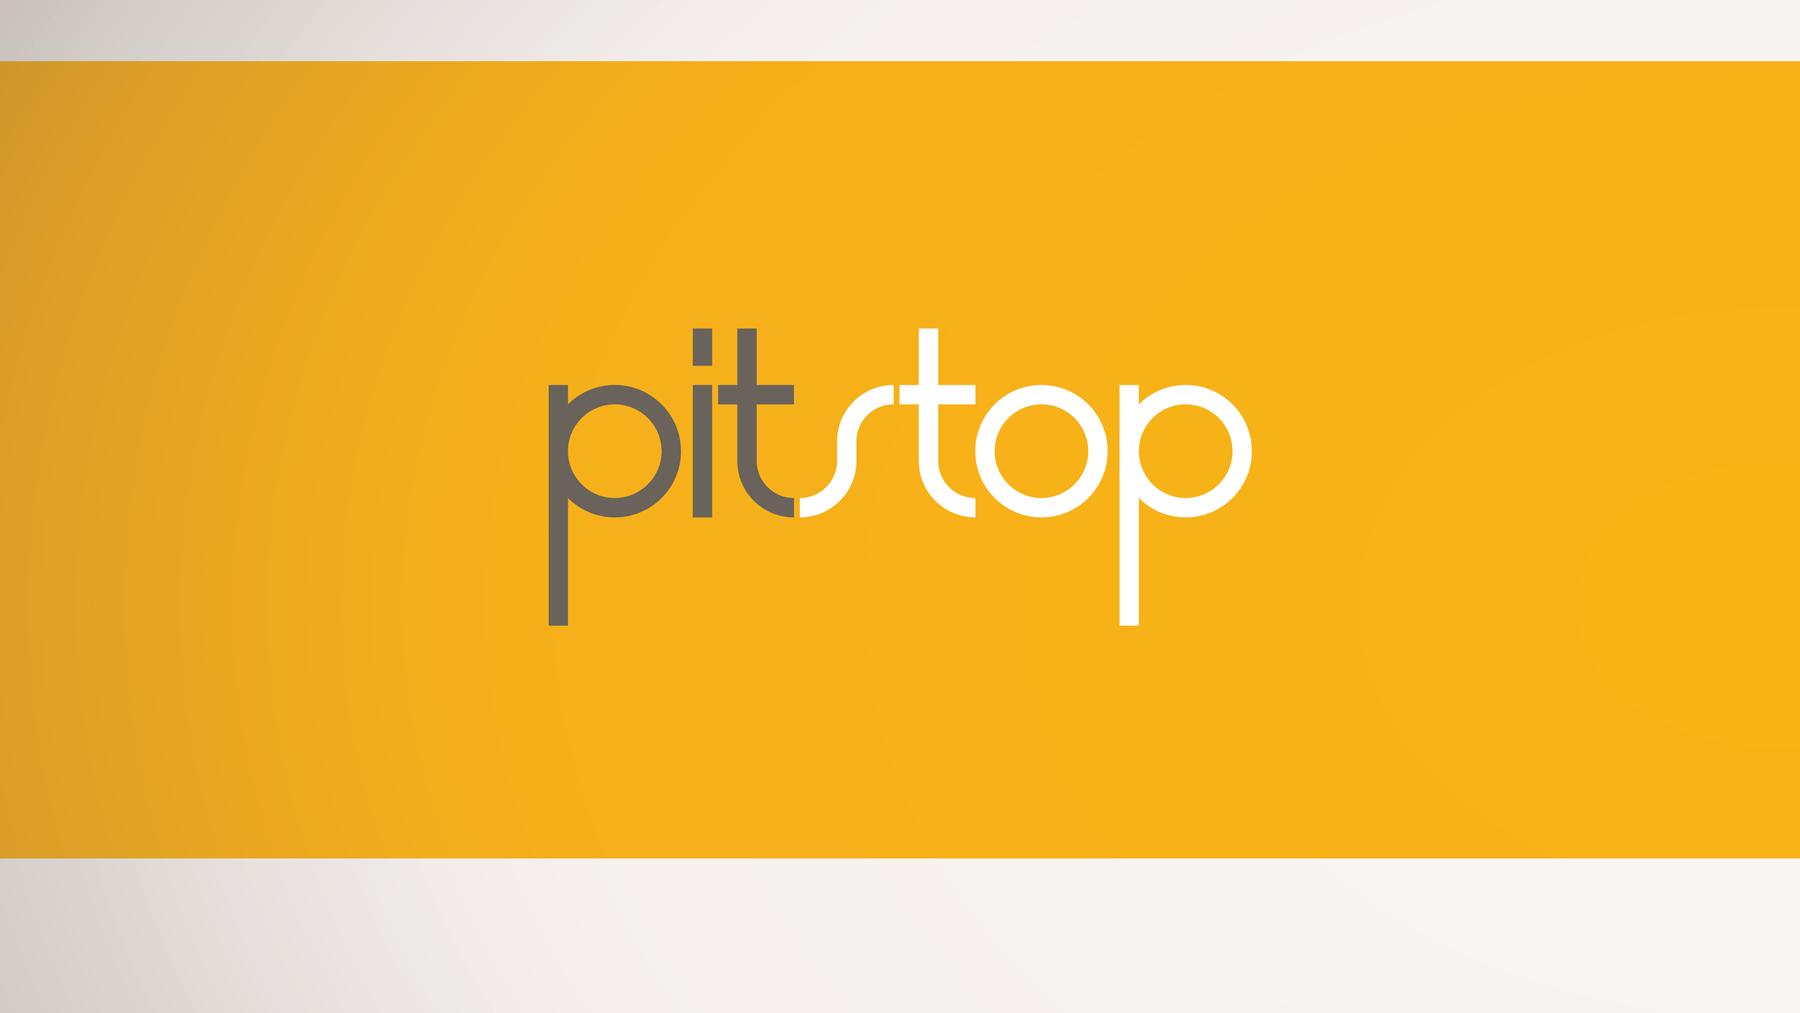 PITSTOP-SUNUM-2021-ING-REV1-01